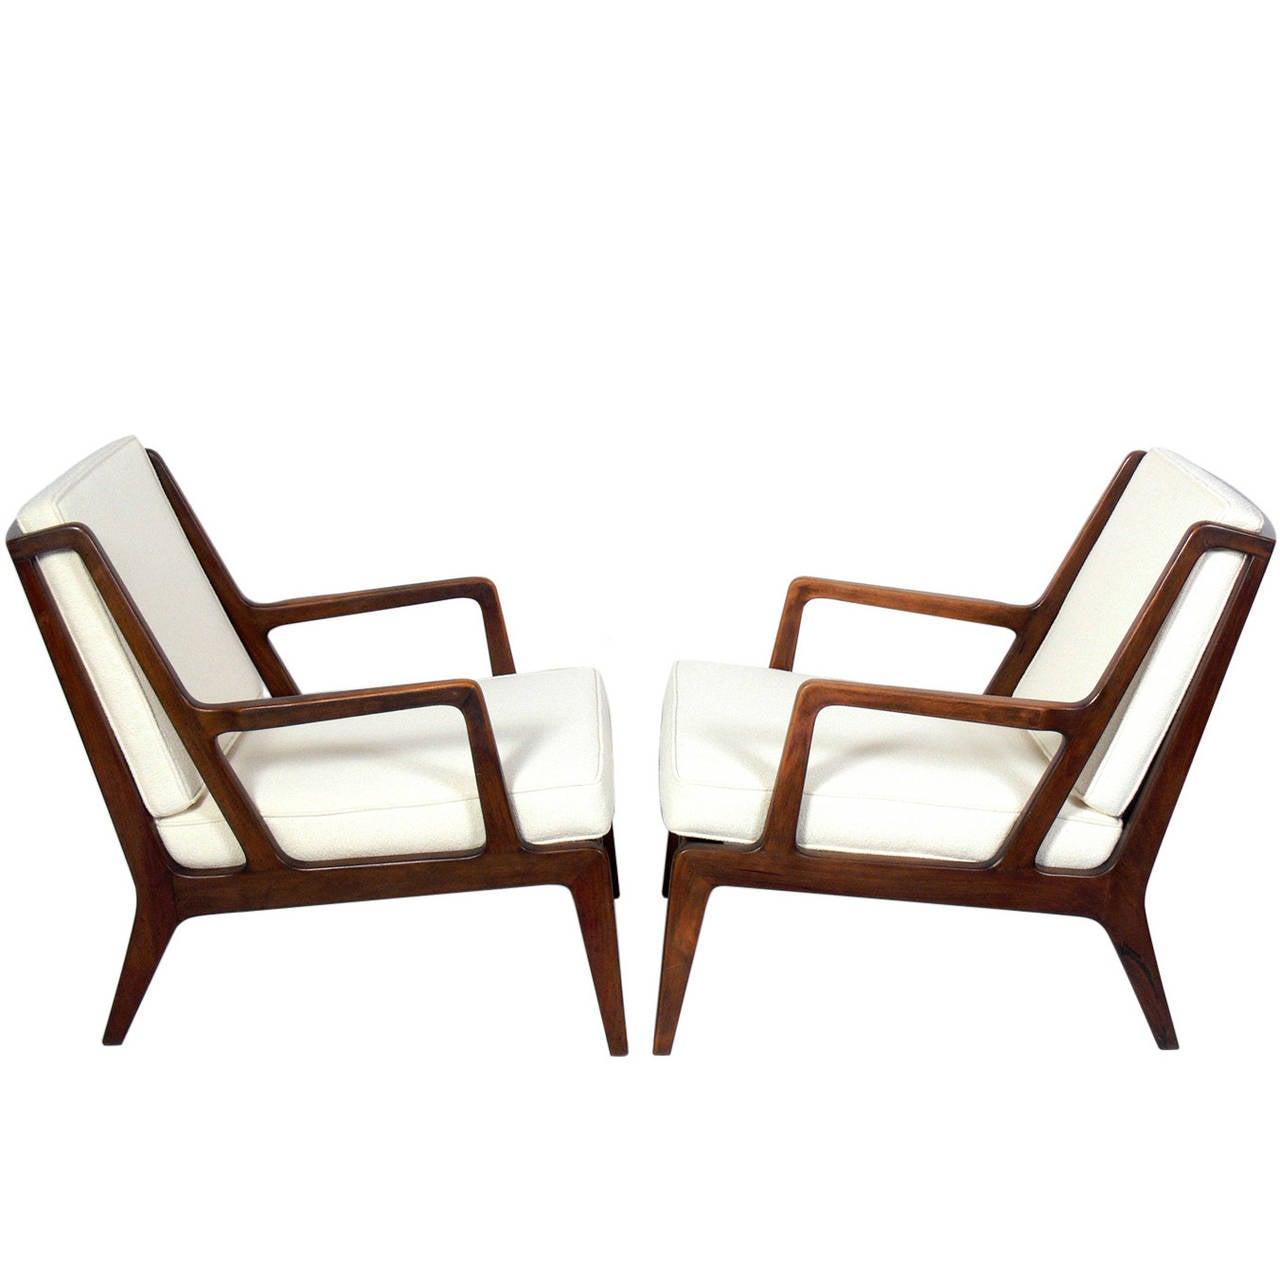 Pair of angular danish modern walnut lounge chairs at 1stdibs for Danish modern chairs